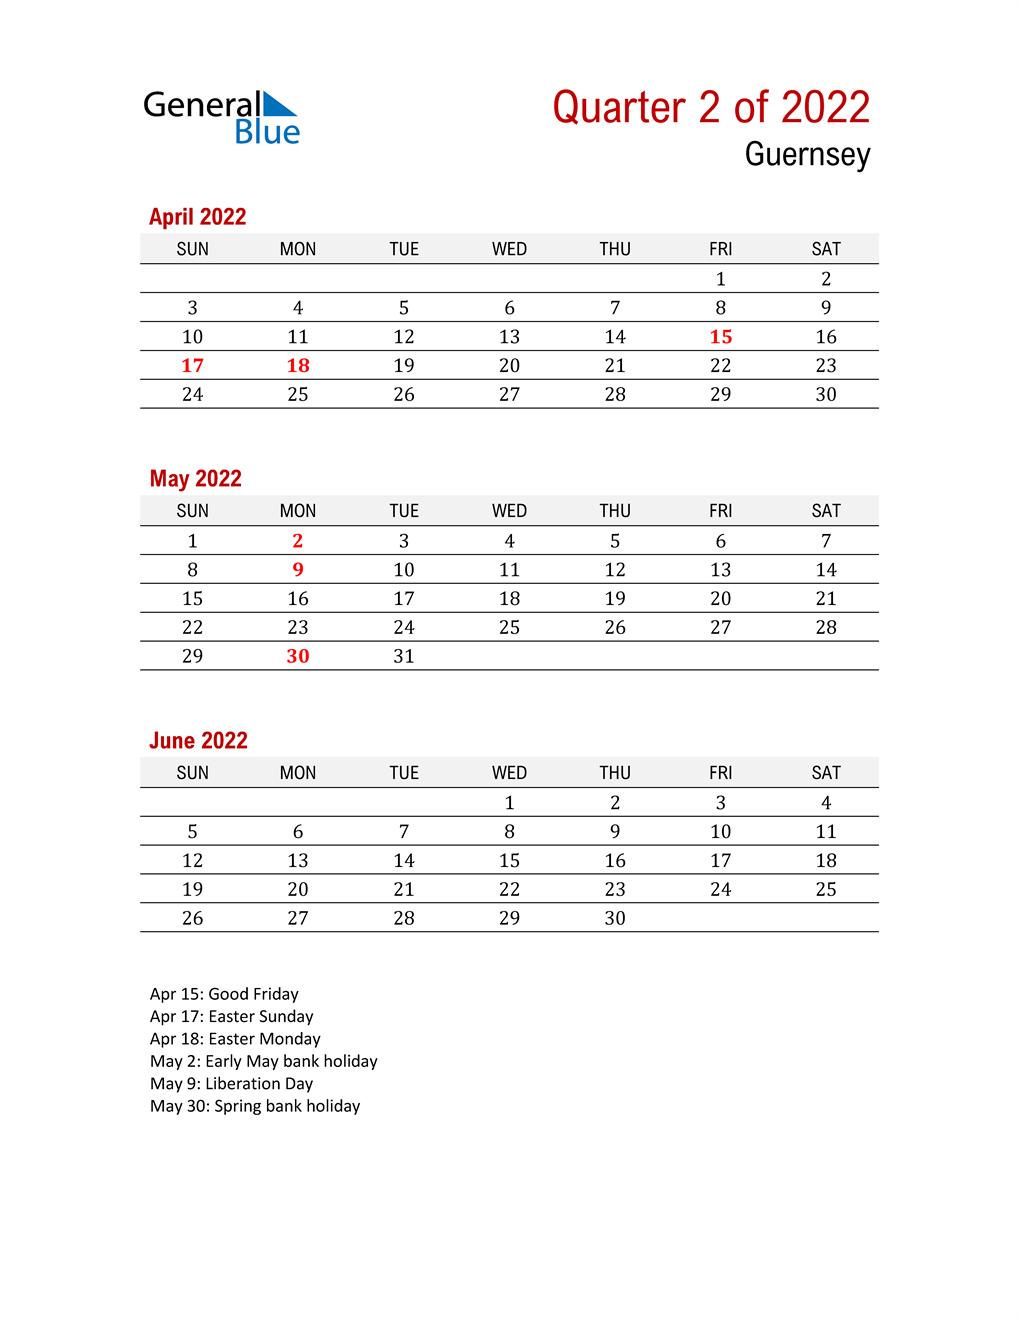 Printable Three Month Calendar for Guernsey